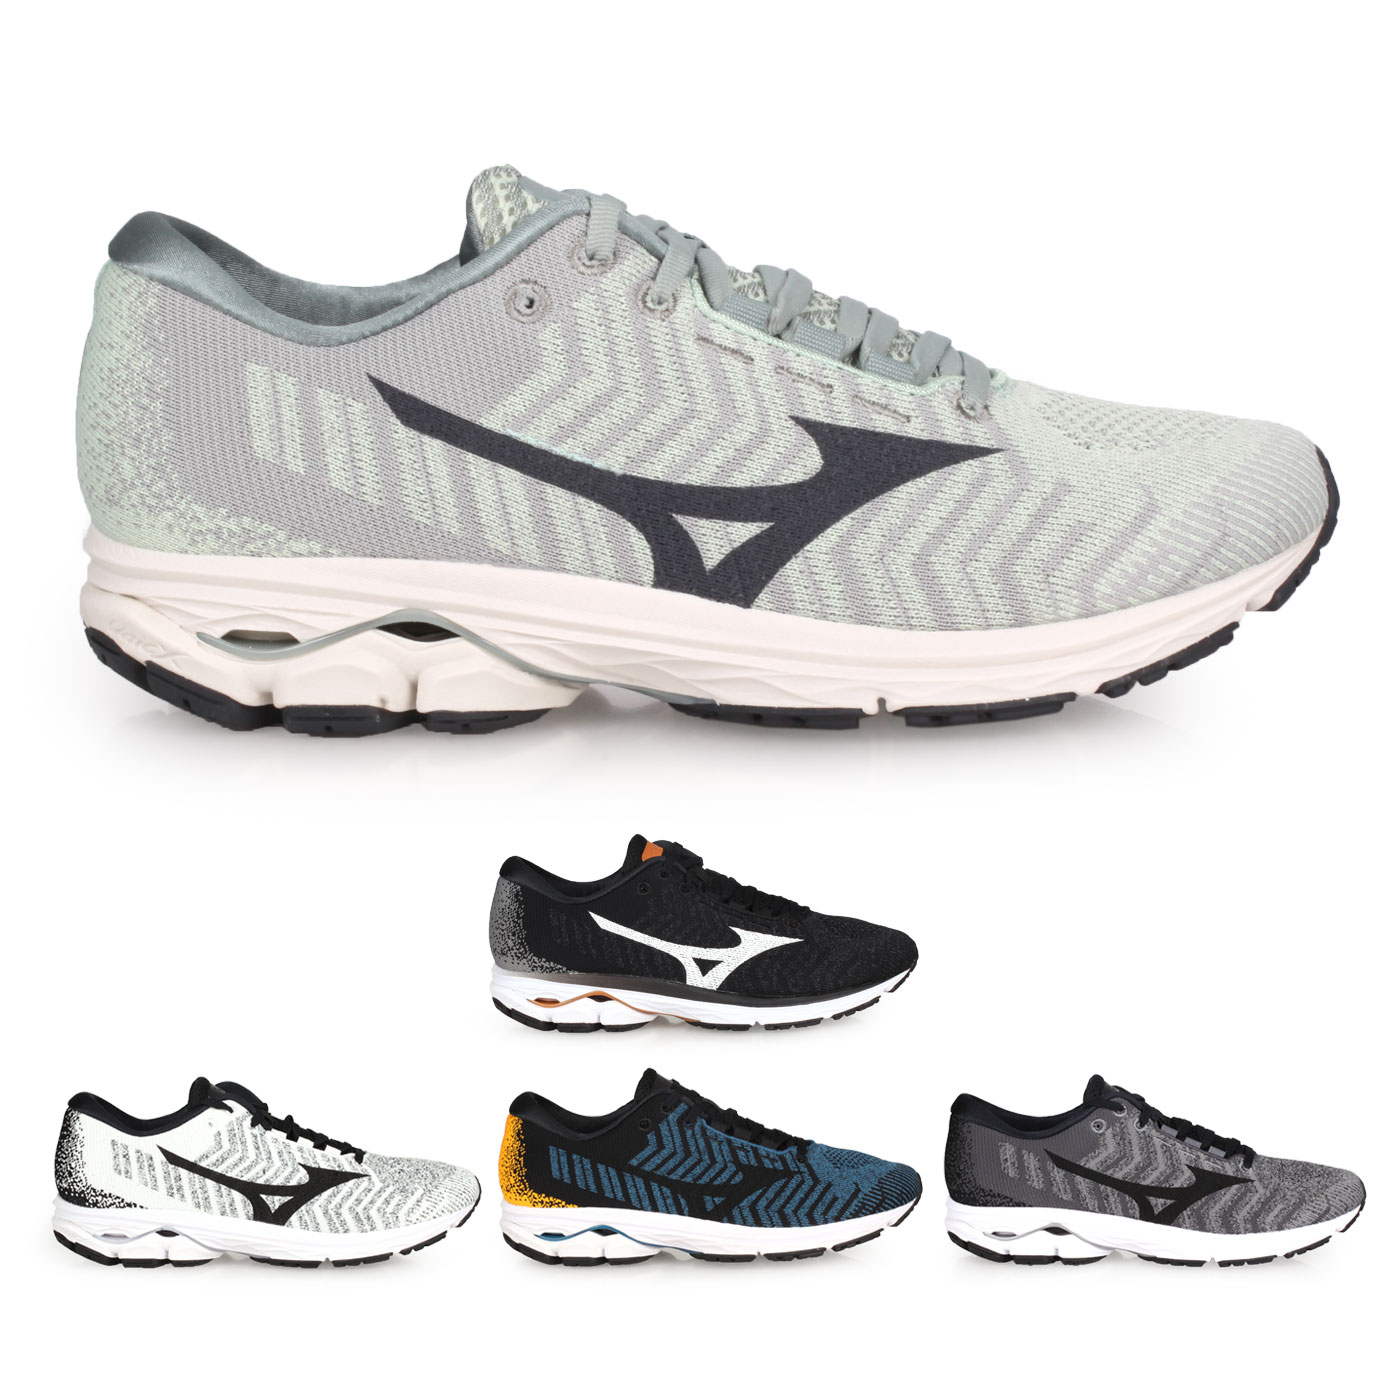 MIZUNO 男款慢跑鞋  @WAVE RIDER WAVEKNIT 3@J1GC192901